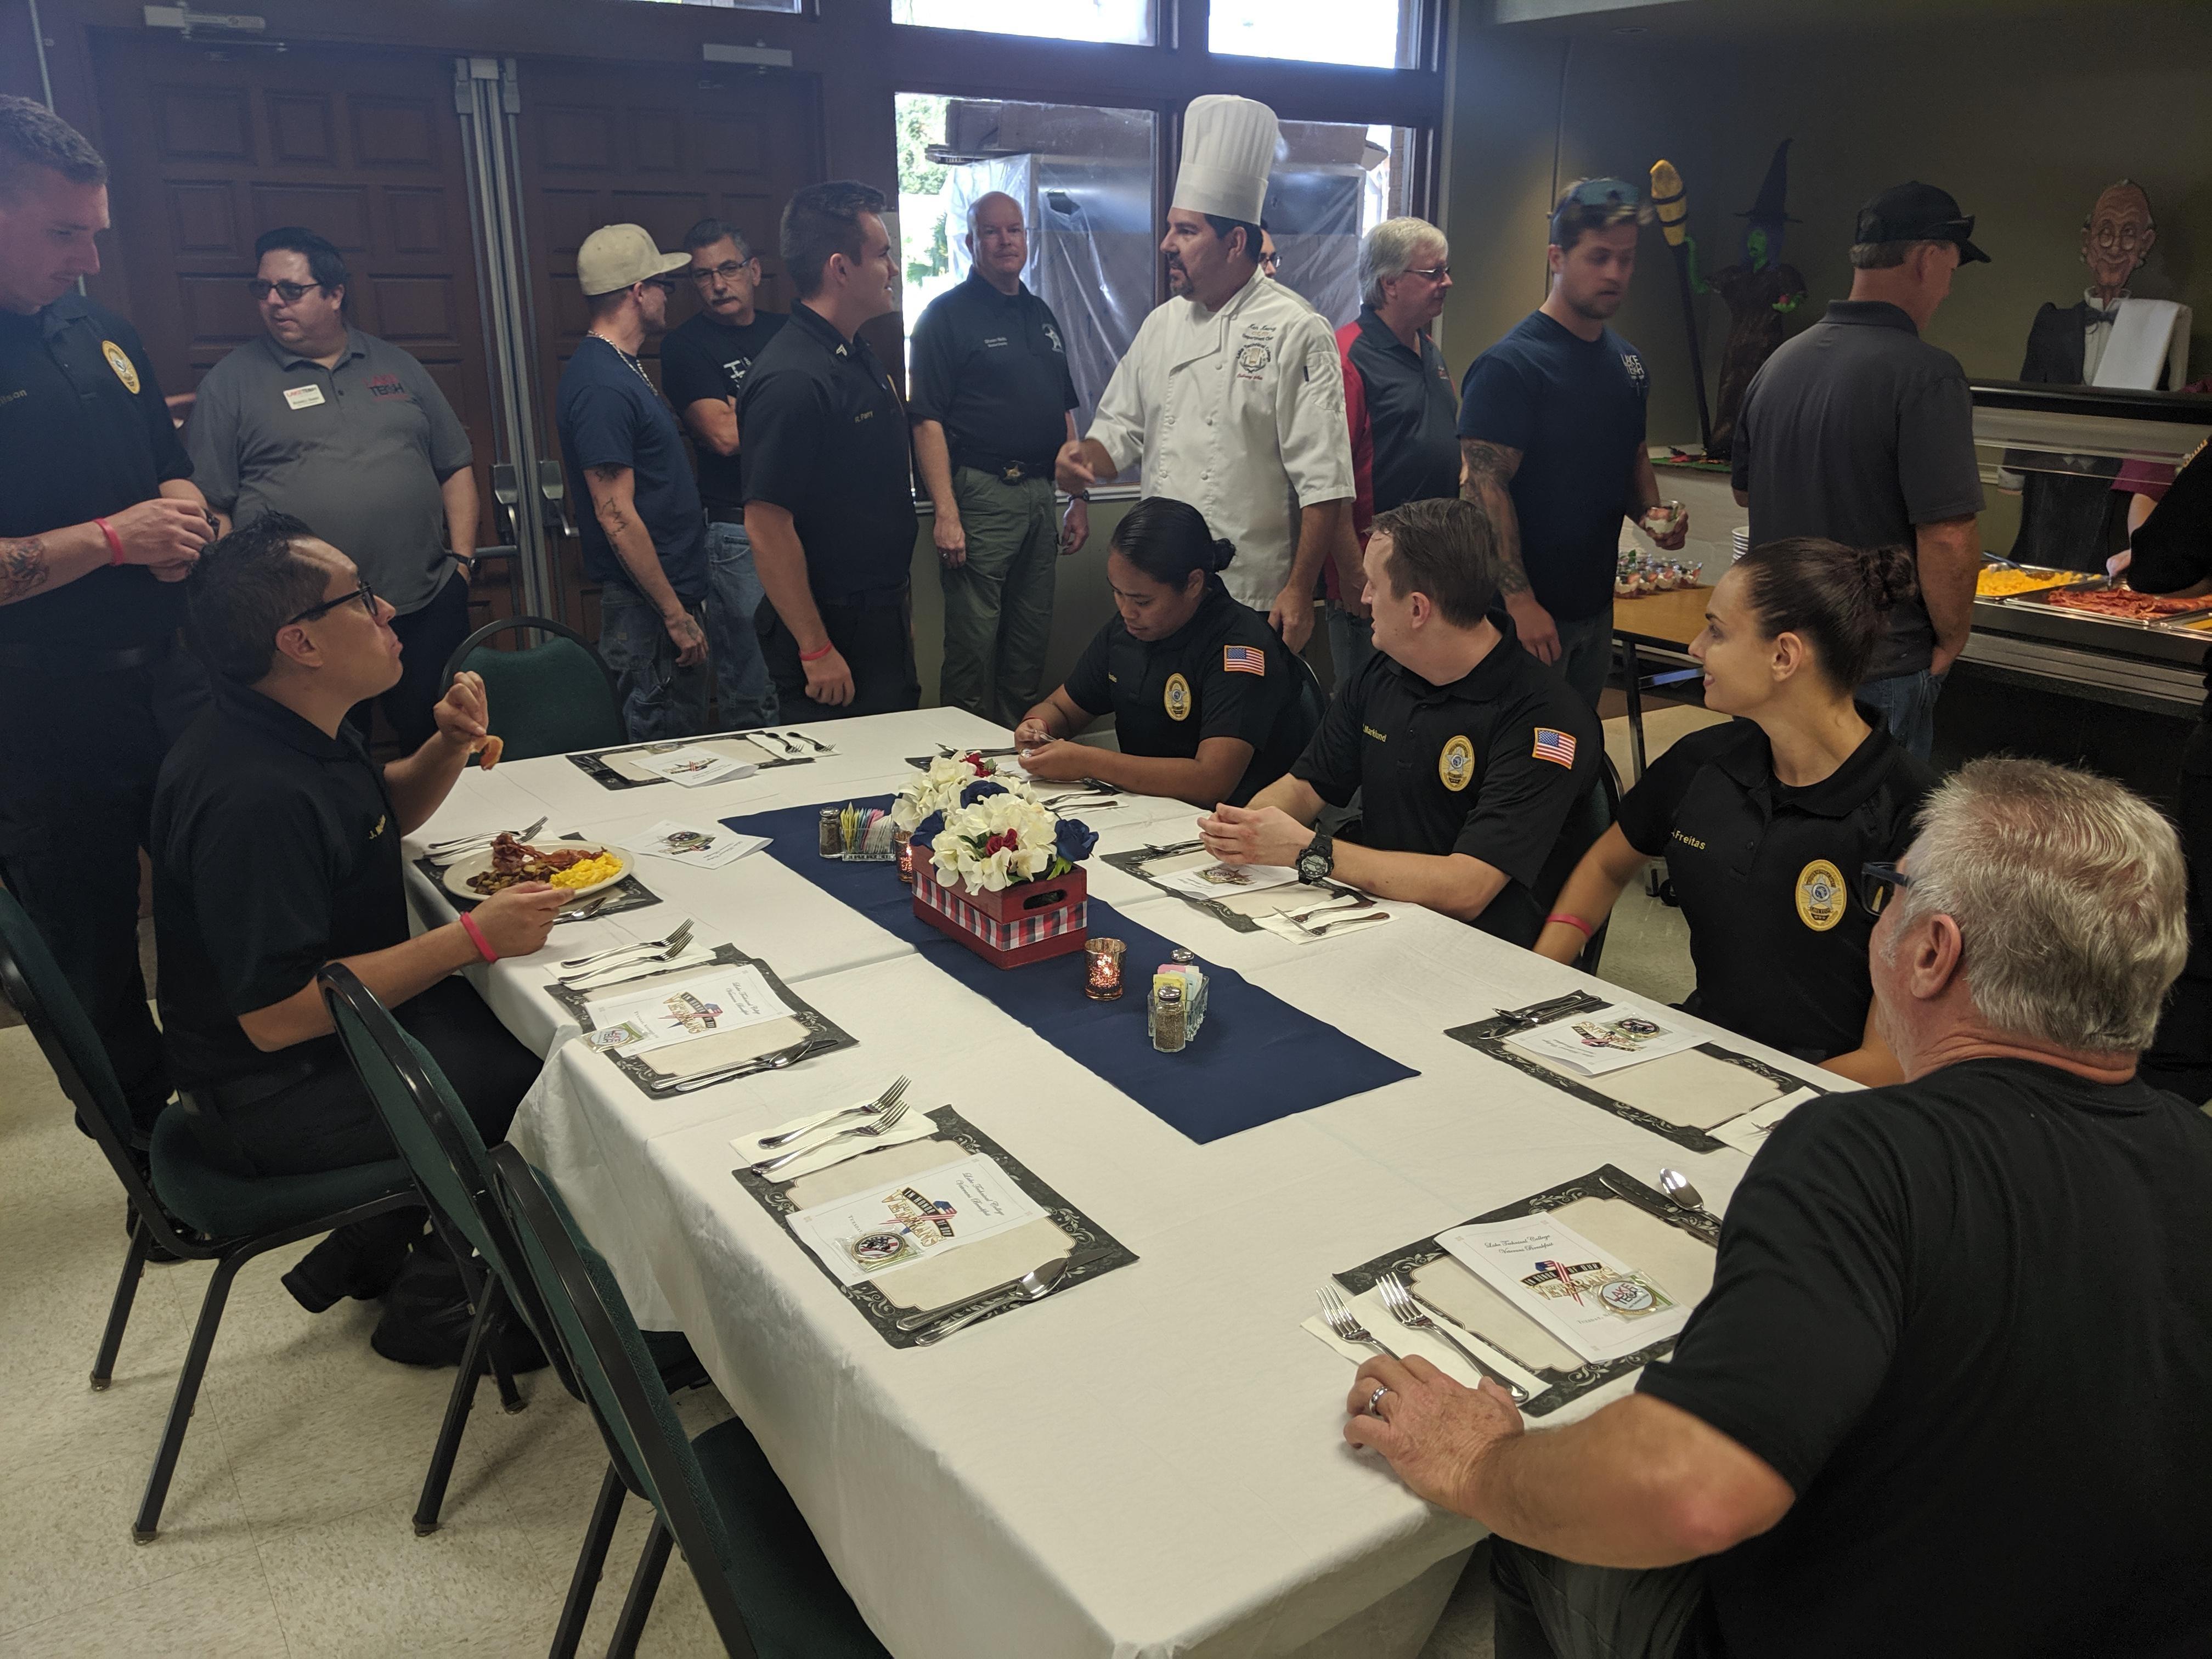 Veterans Breakfast6 110819 Student Affairs 11/08/19